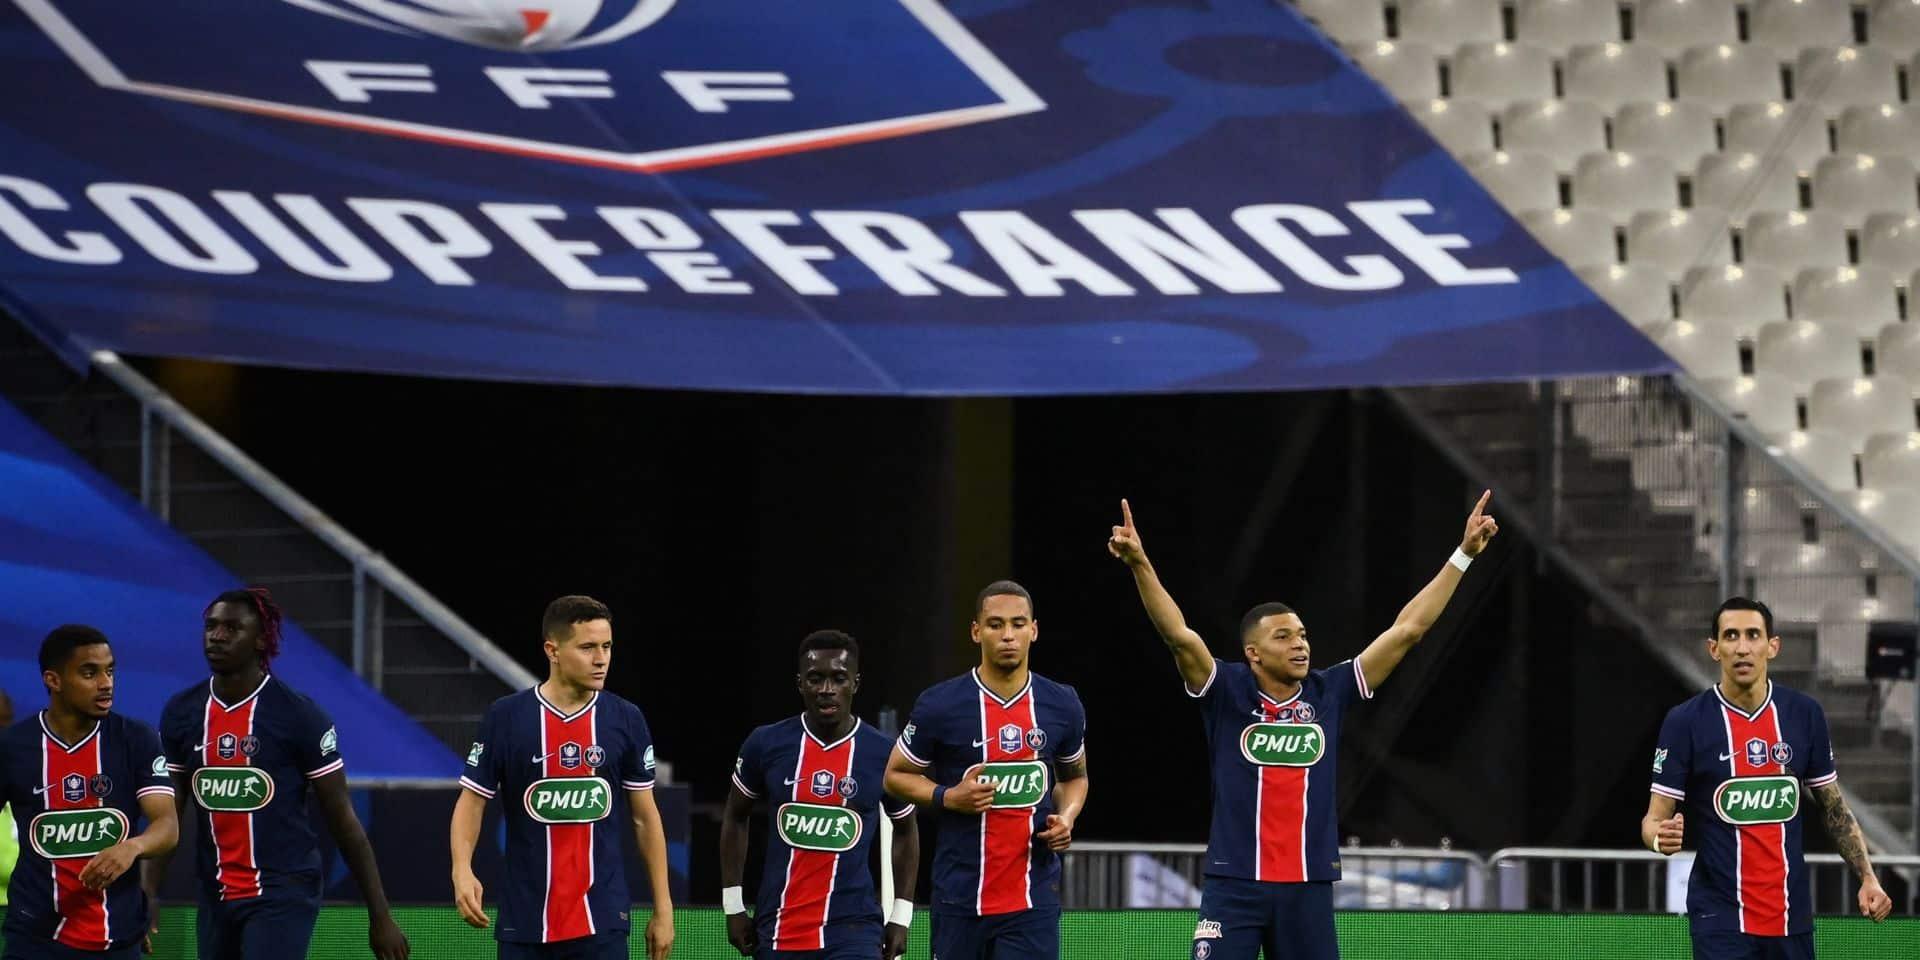 Le PSG remporte sa 14e Coupe de France